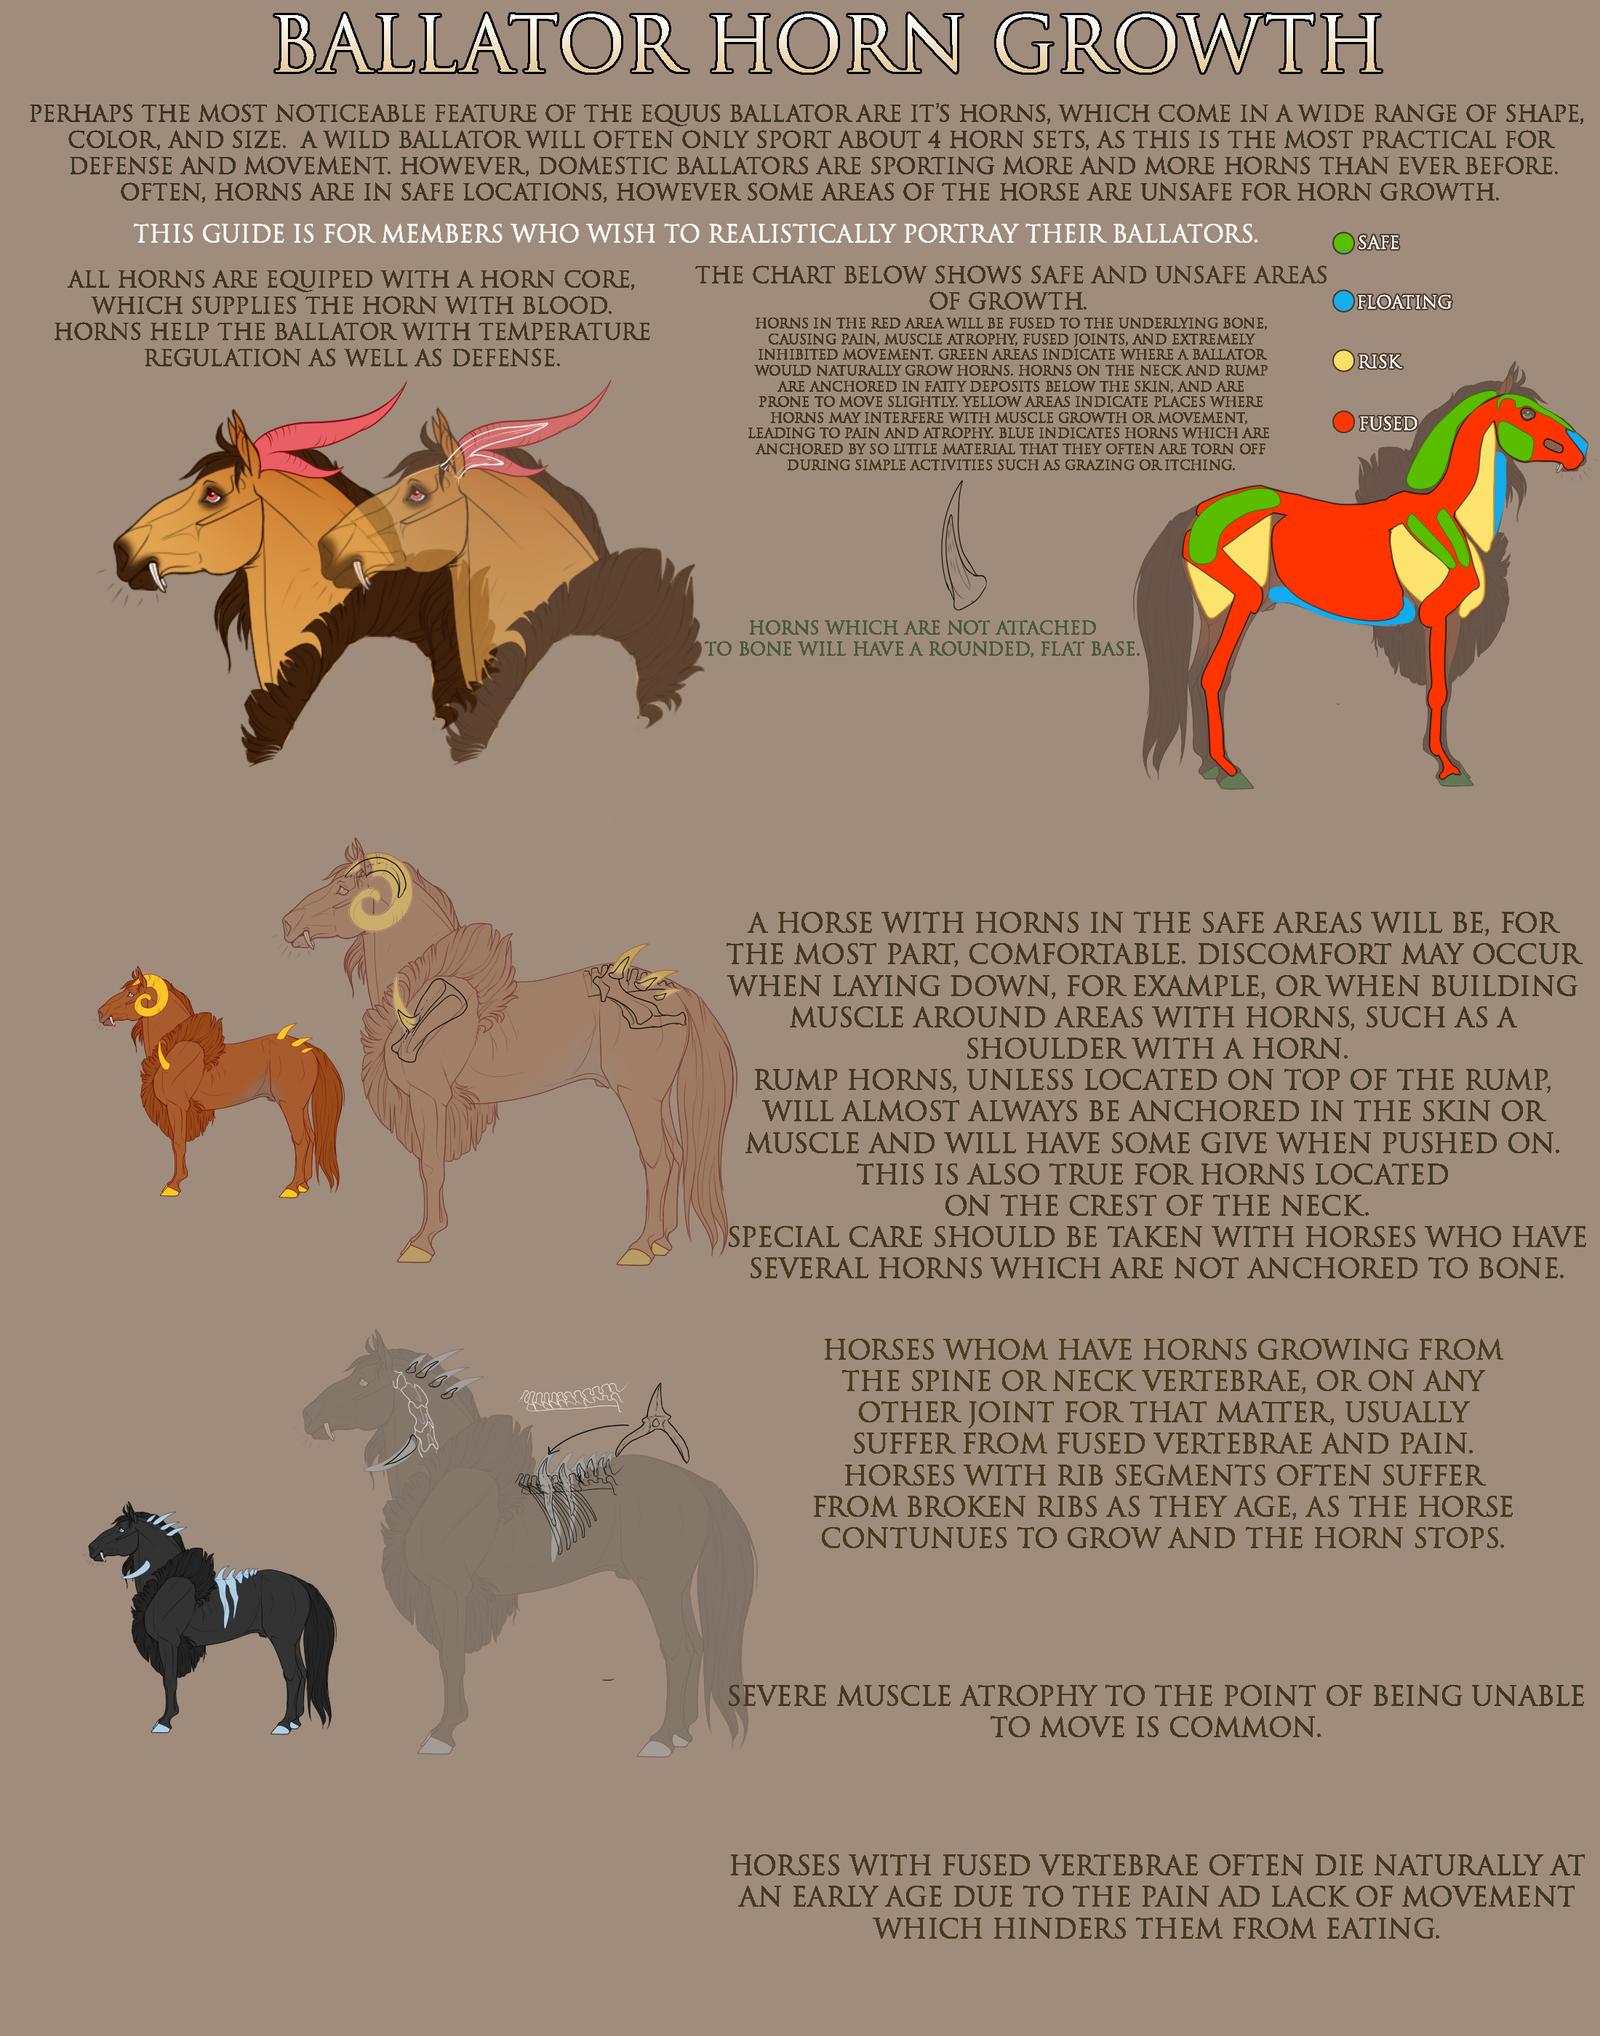 Horn Growth By Equusballatorsociety On Deviantart